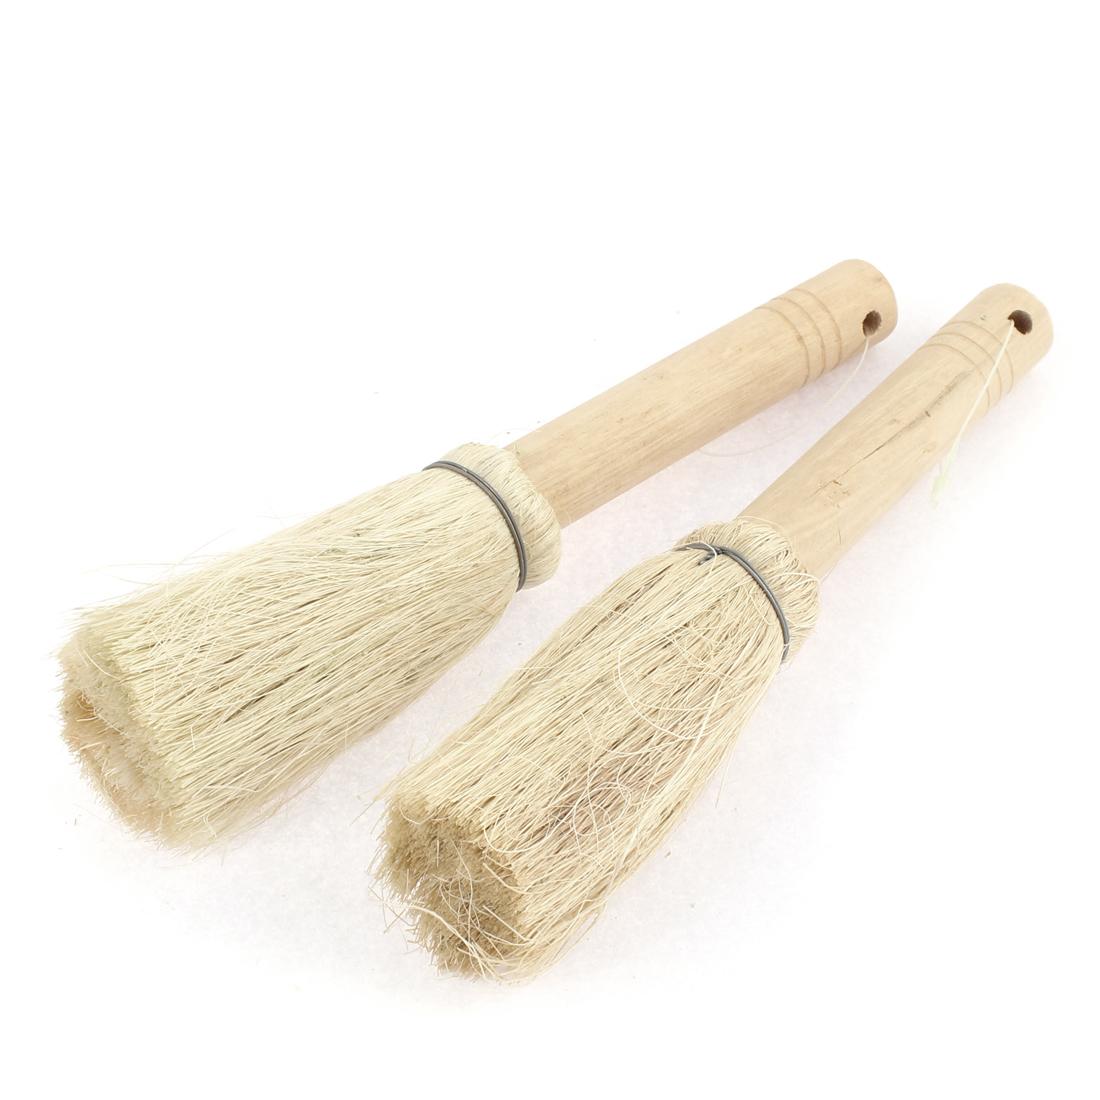 Kitchen Pot Pan Bowl Plate Wooden Handle Bristle Scrubber Brush Cleaner 2pcs